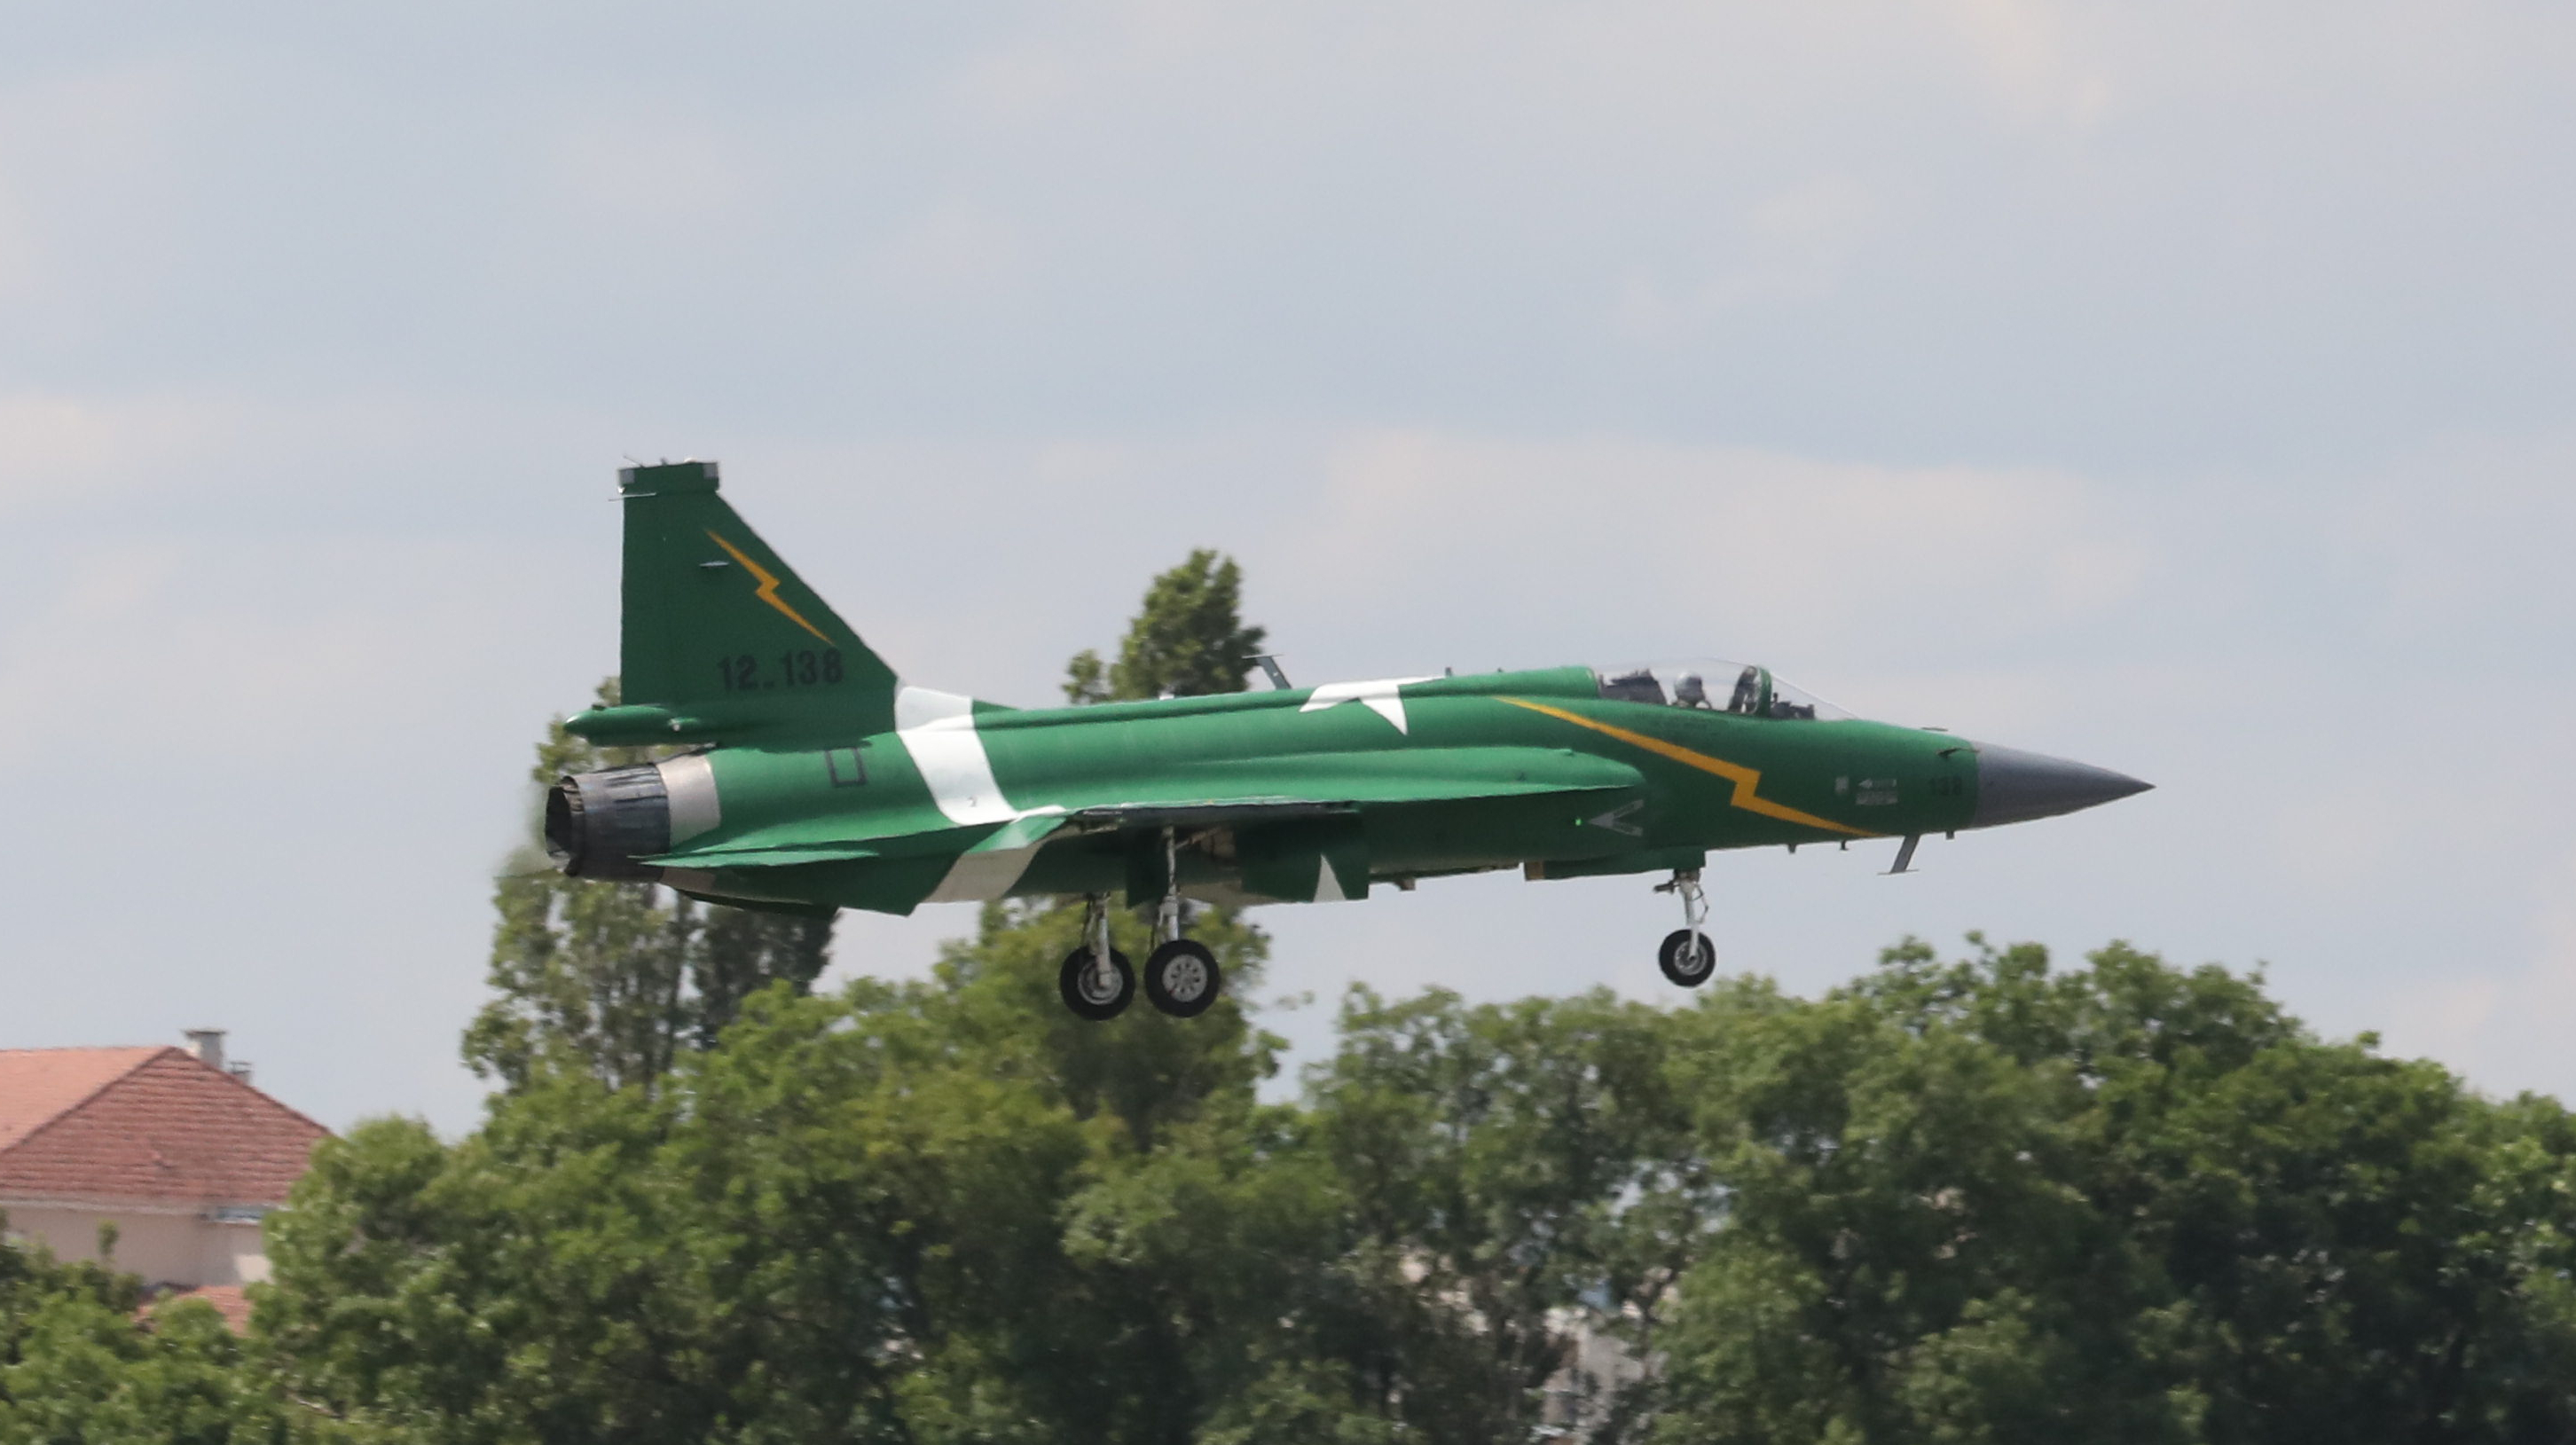 File:JF-17 Thunder 18.jpg - Wikimedia Commons